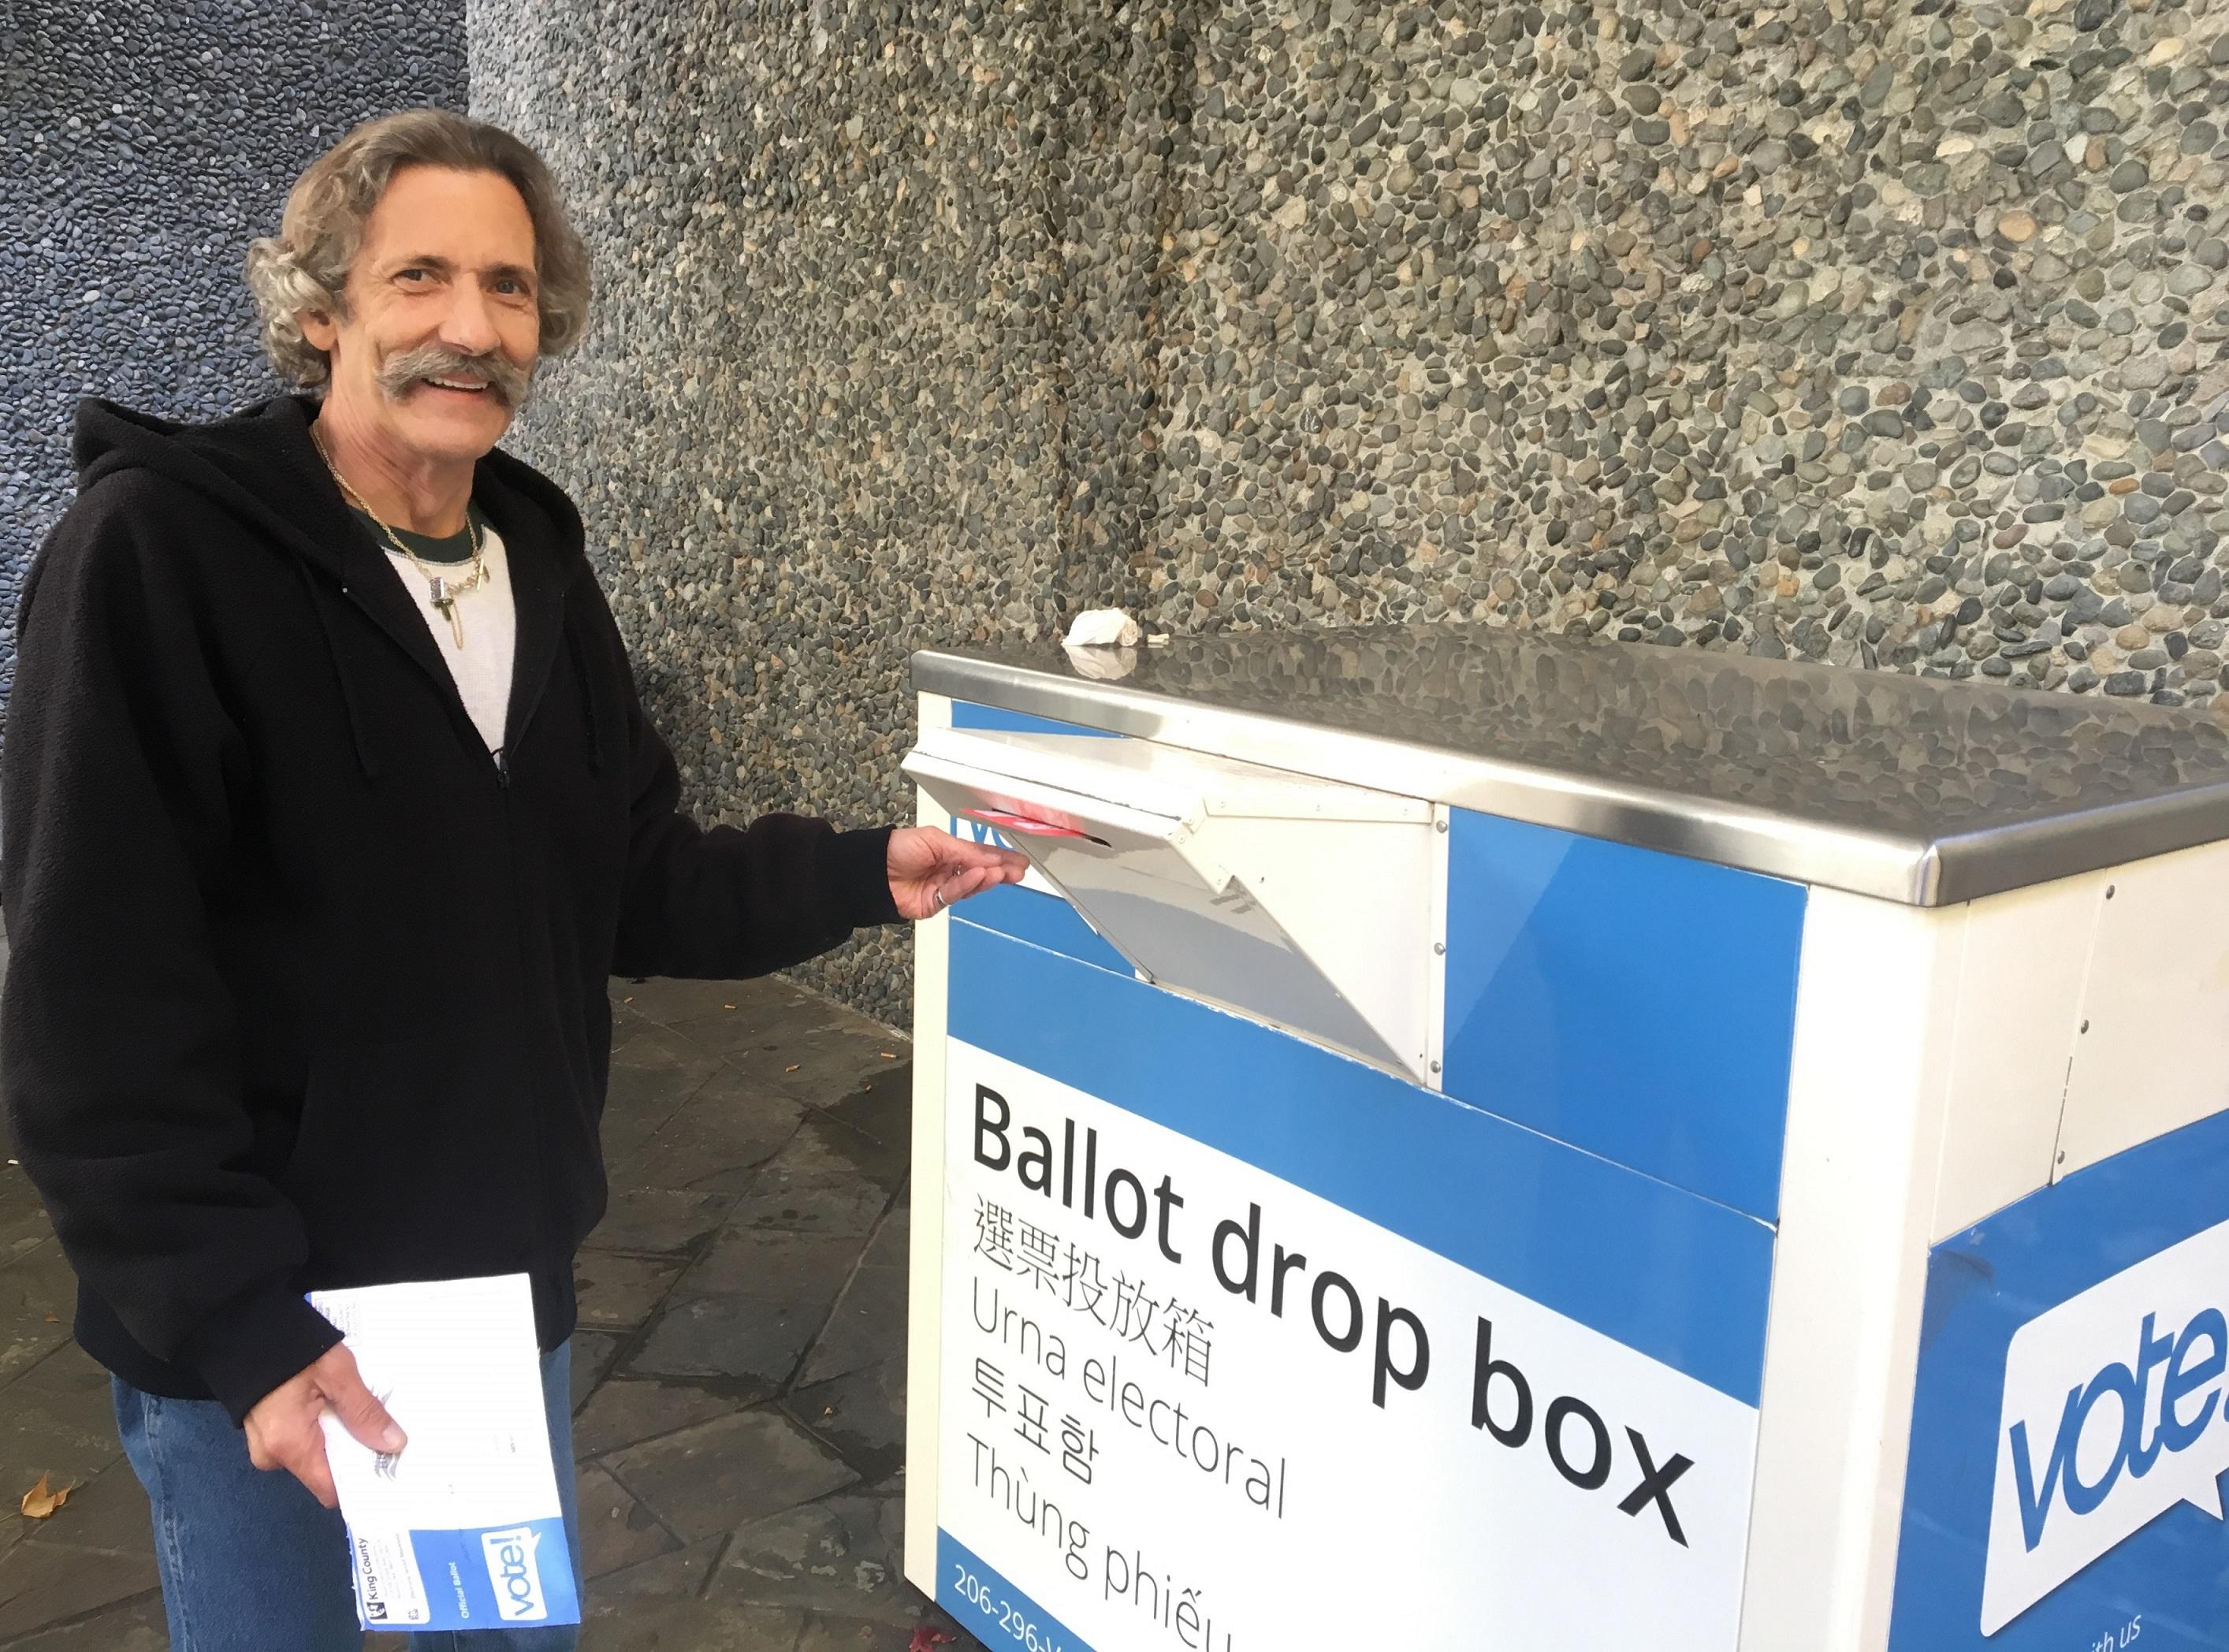 dennis-votes-first-time-smaller